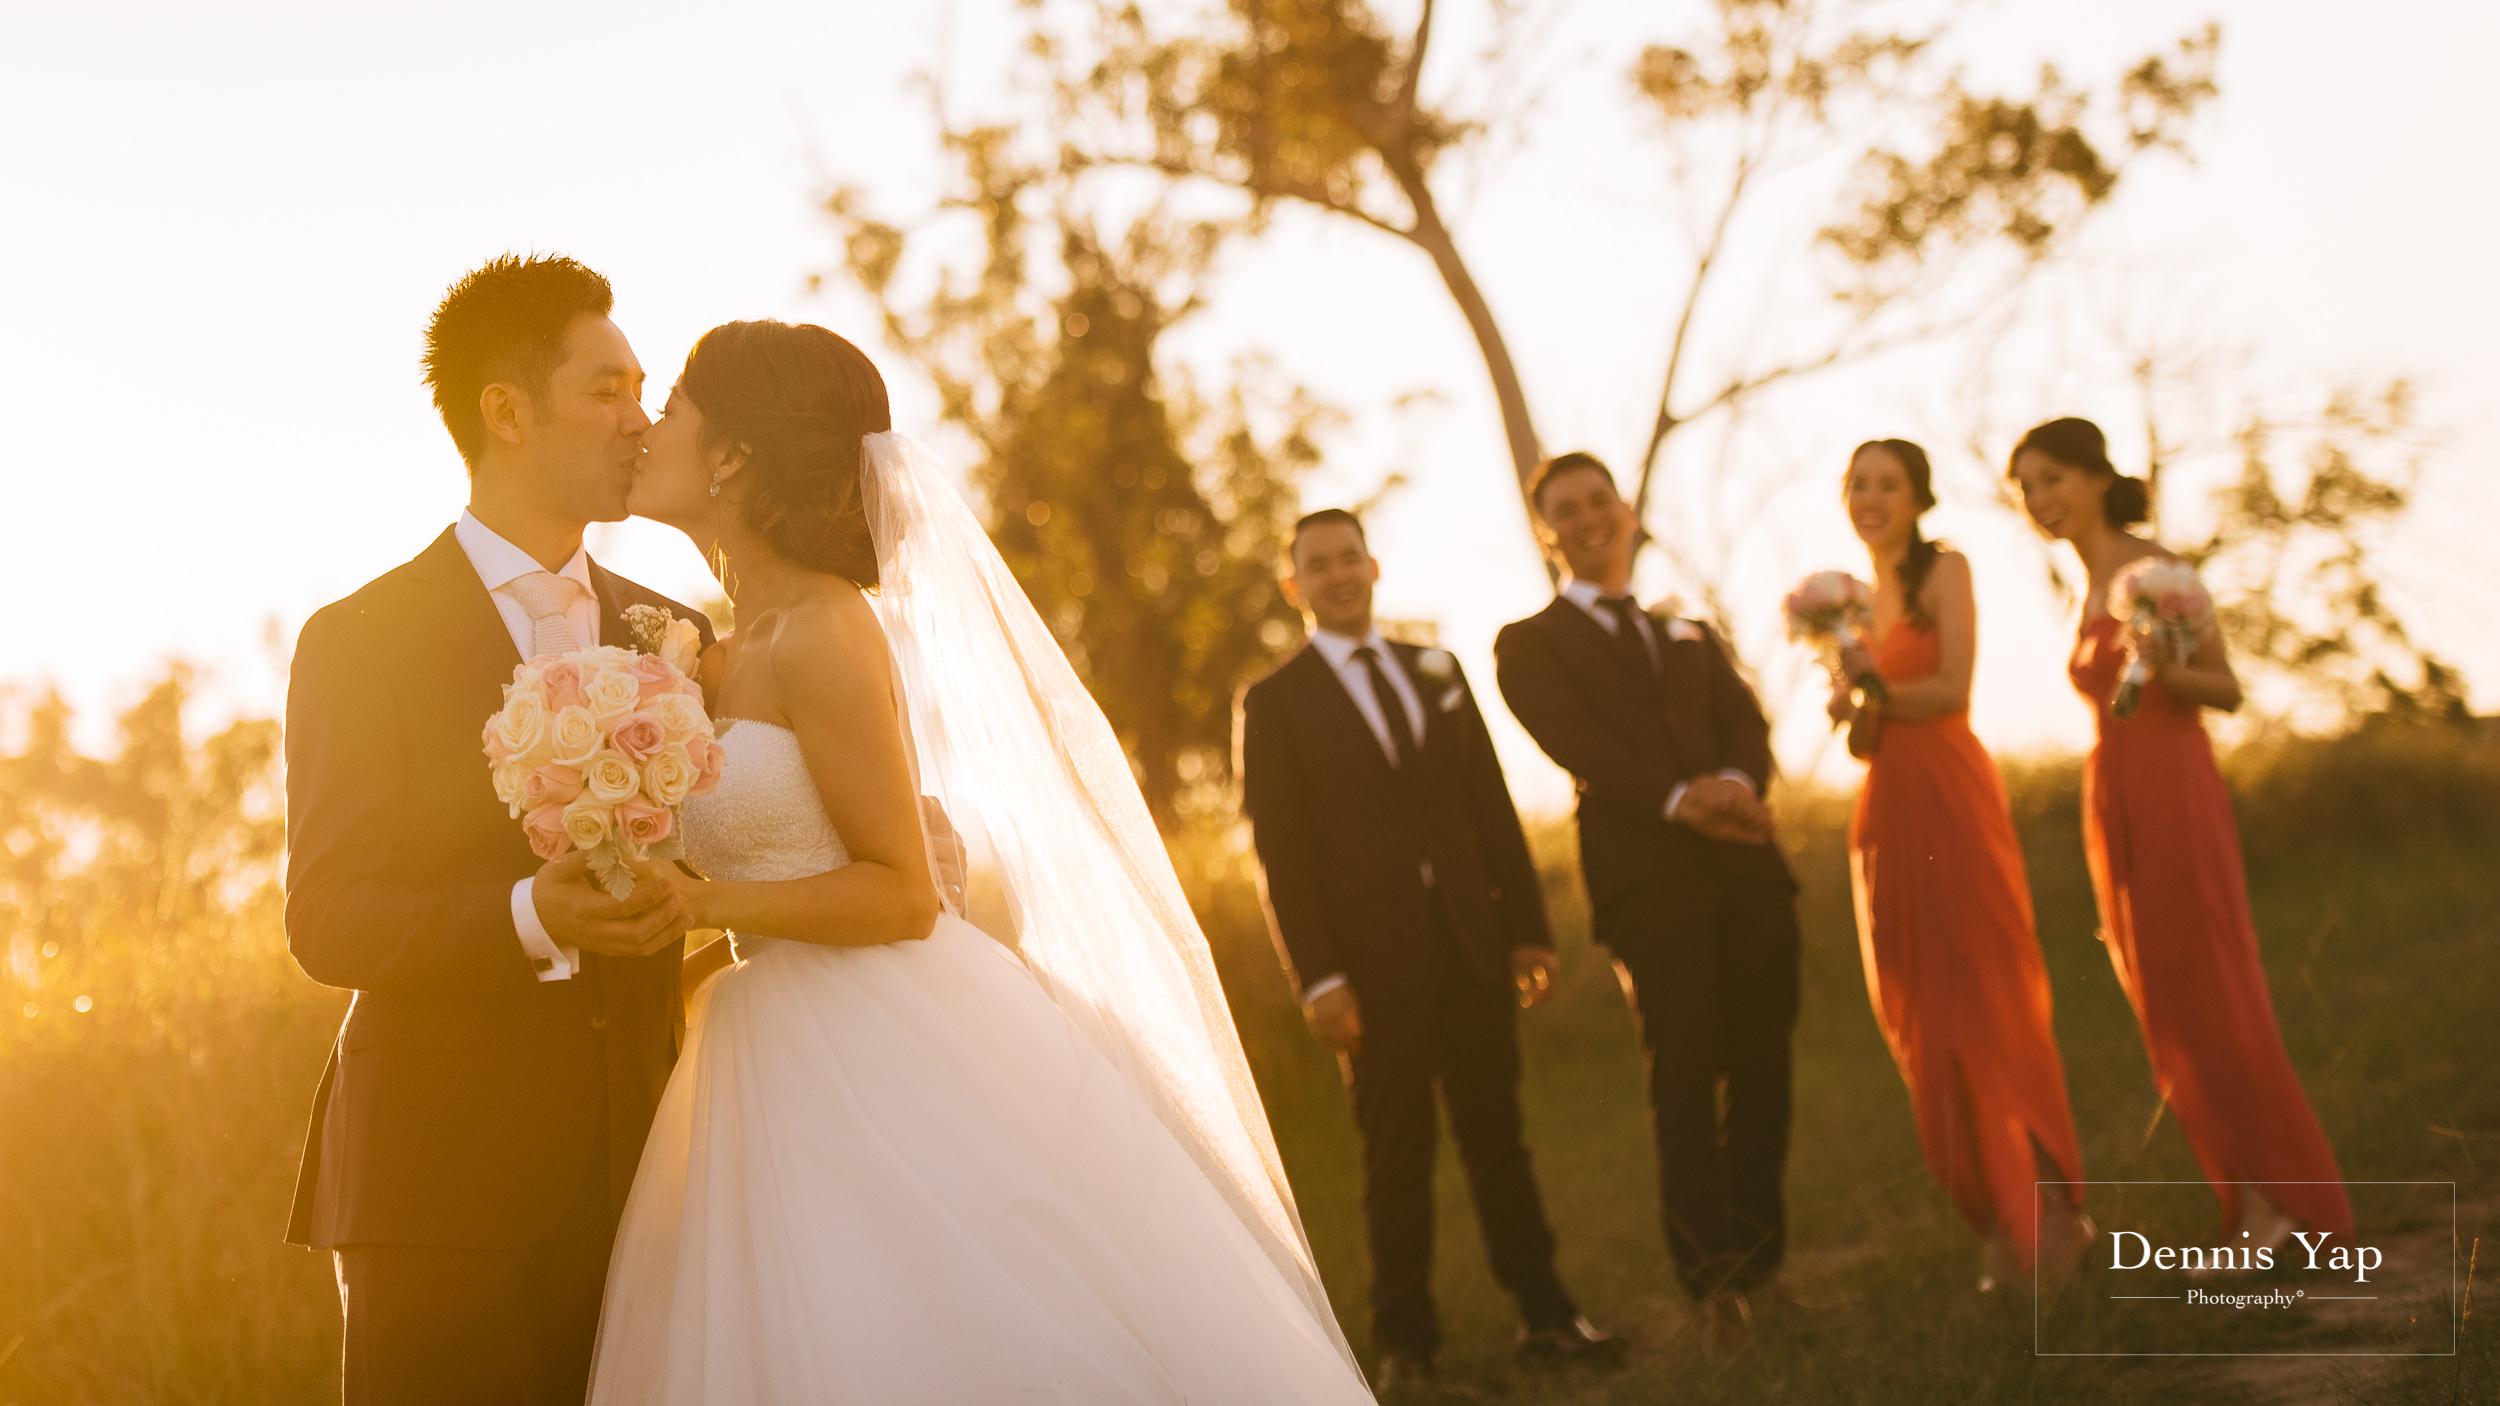 thang veng vietnamese wedding brisbane dennis yap photography malaysia wedding photographer-32.jpg